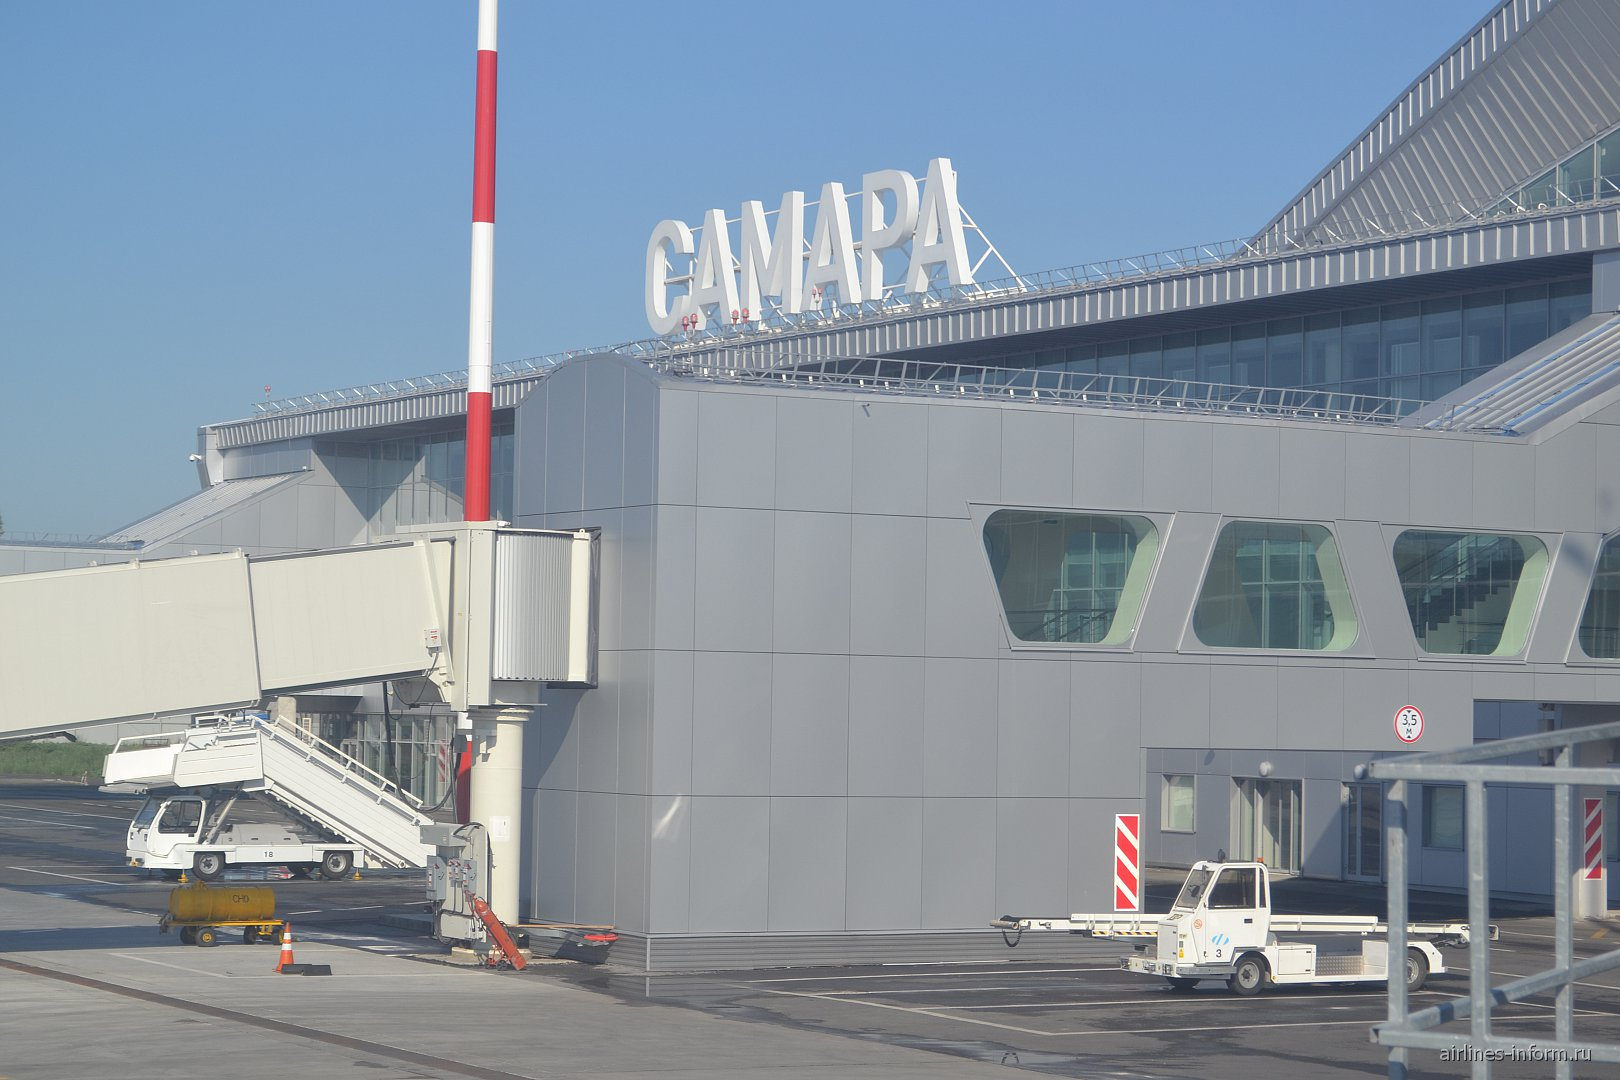 Пассажирские терминал аэропорта Самара Курумоч